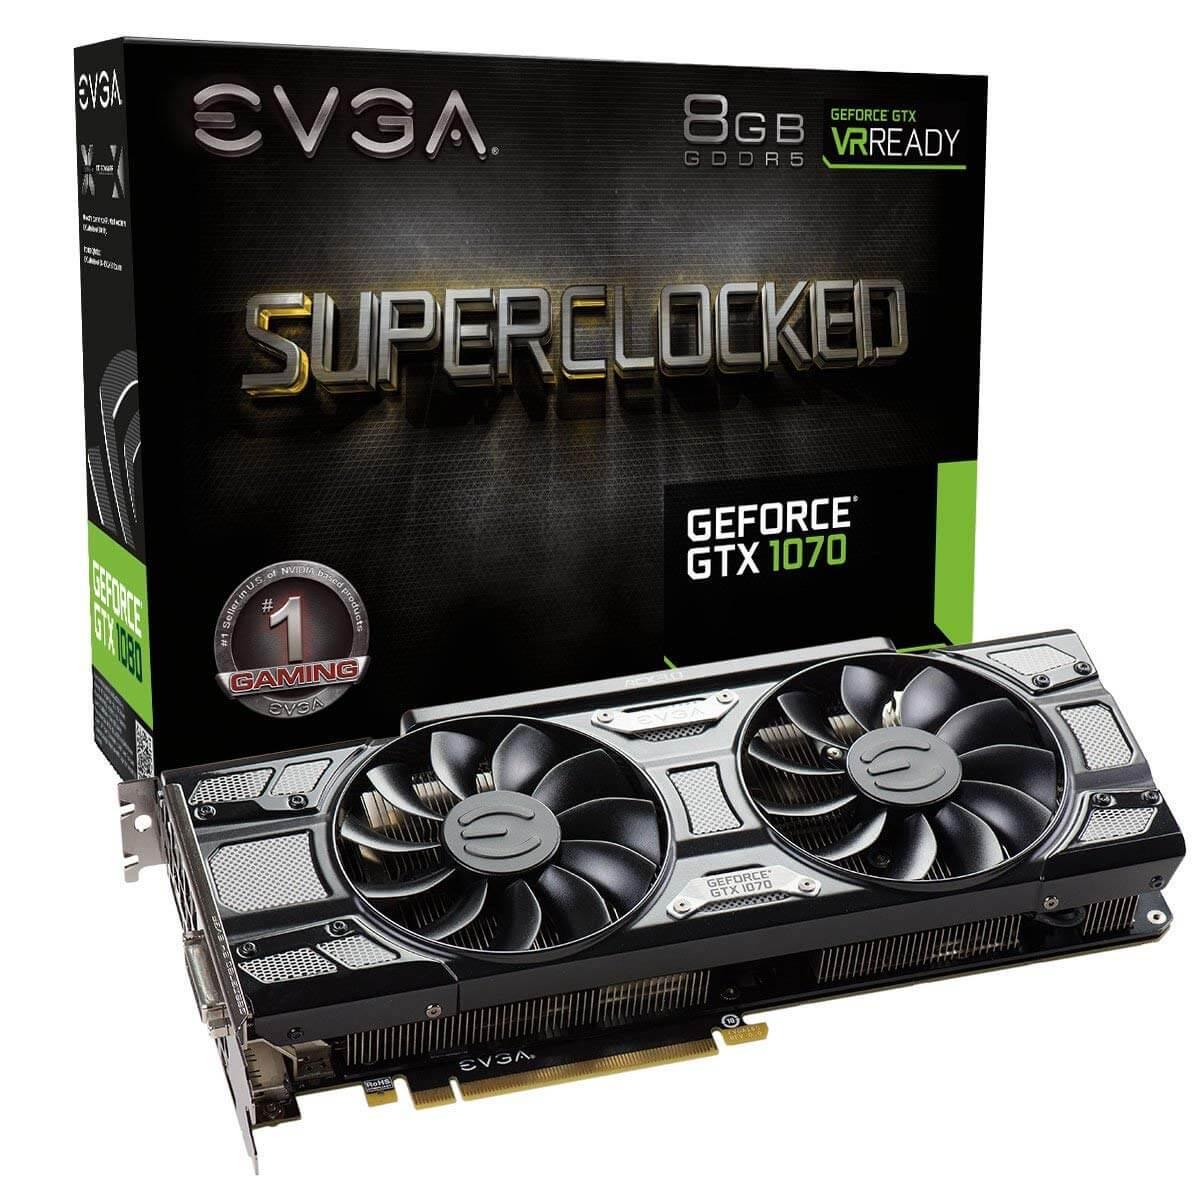 כרטיס מסך EVGA GeForce GTX 1070 8GB GDDR5